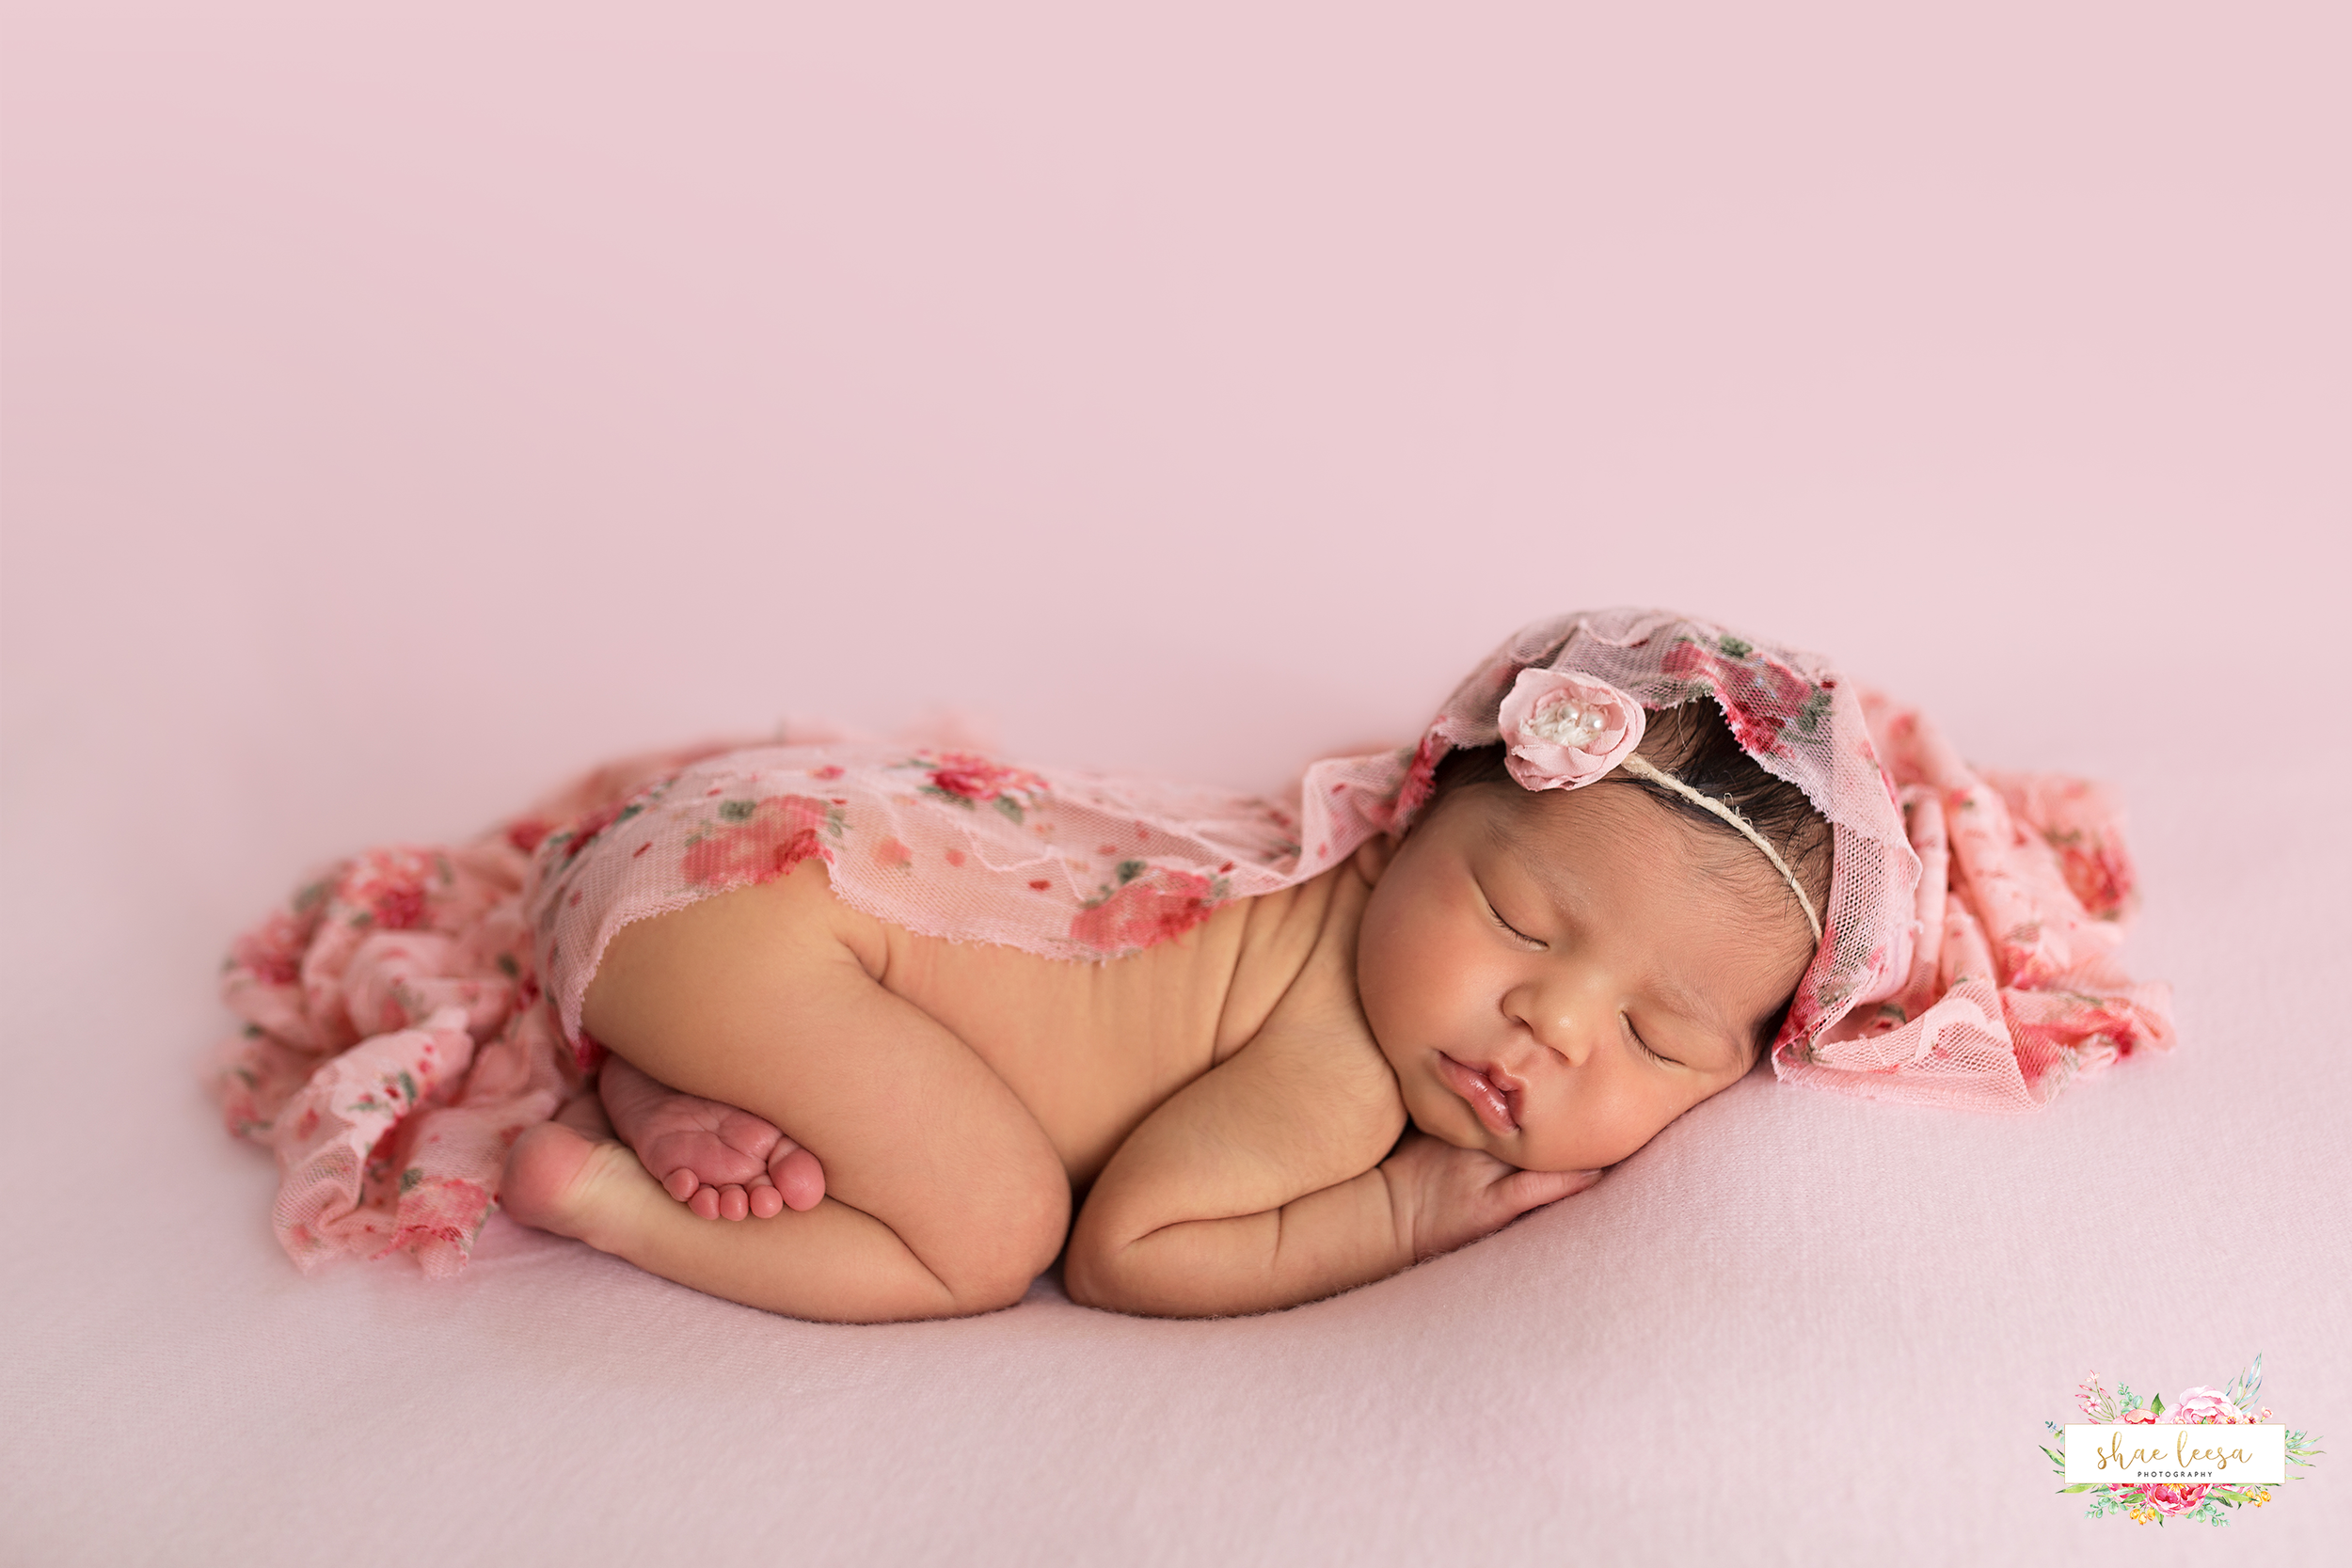 Newborn Photographer Mackay.png